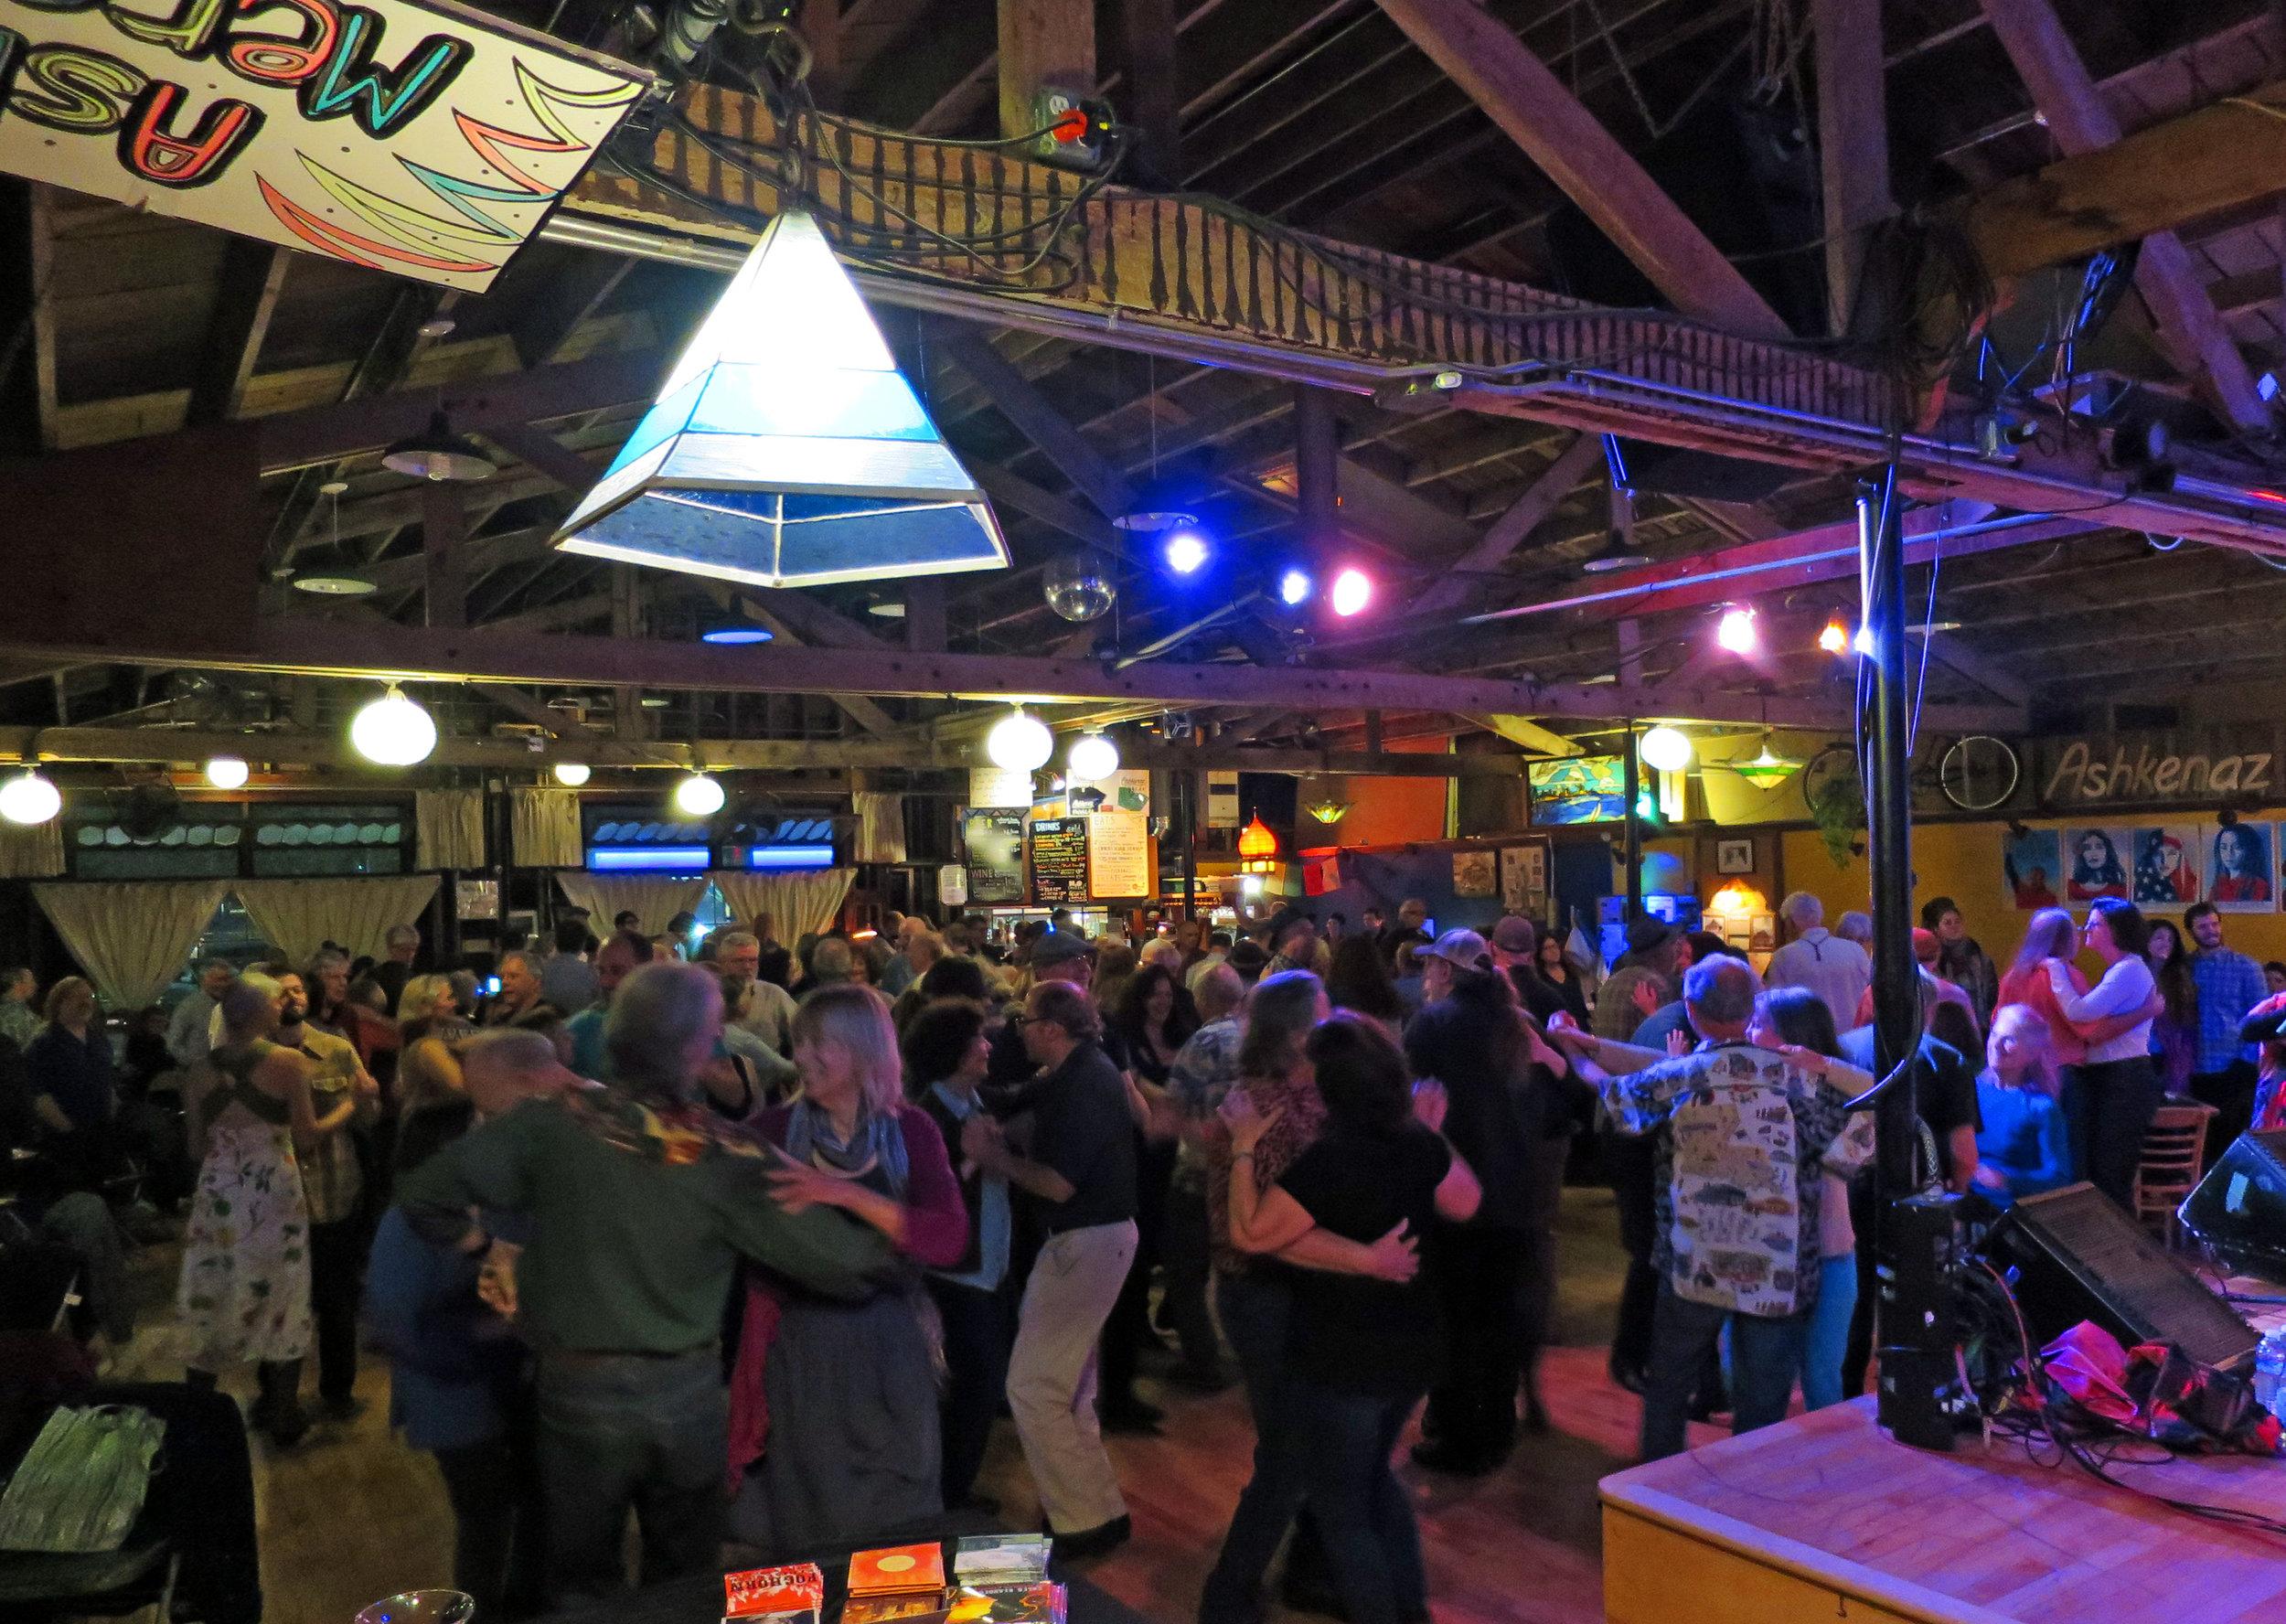 2017 BOTMC Dance Party at Ashkenaz